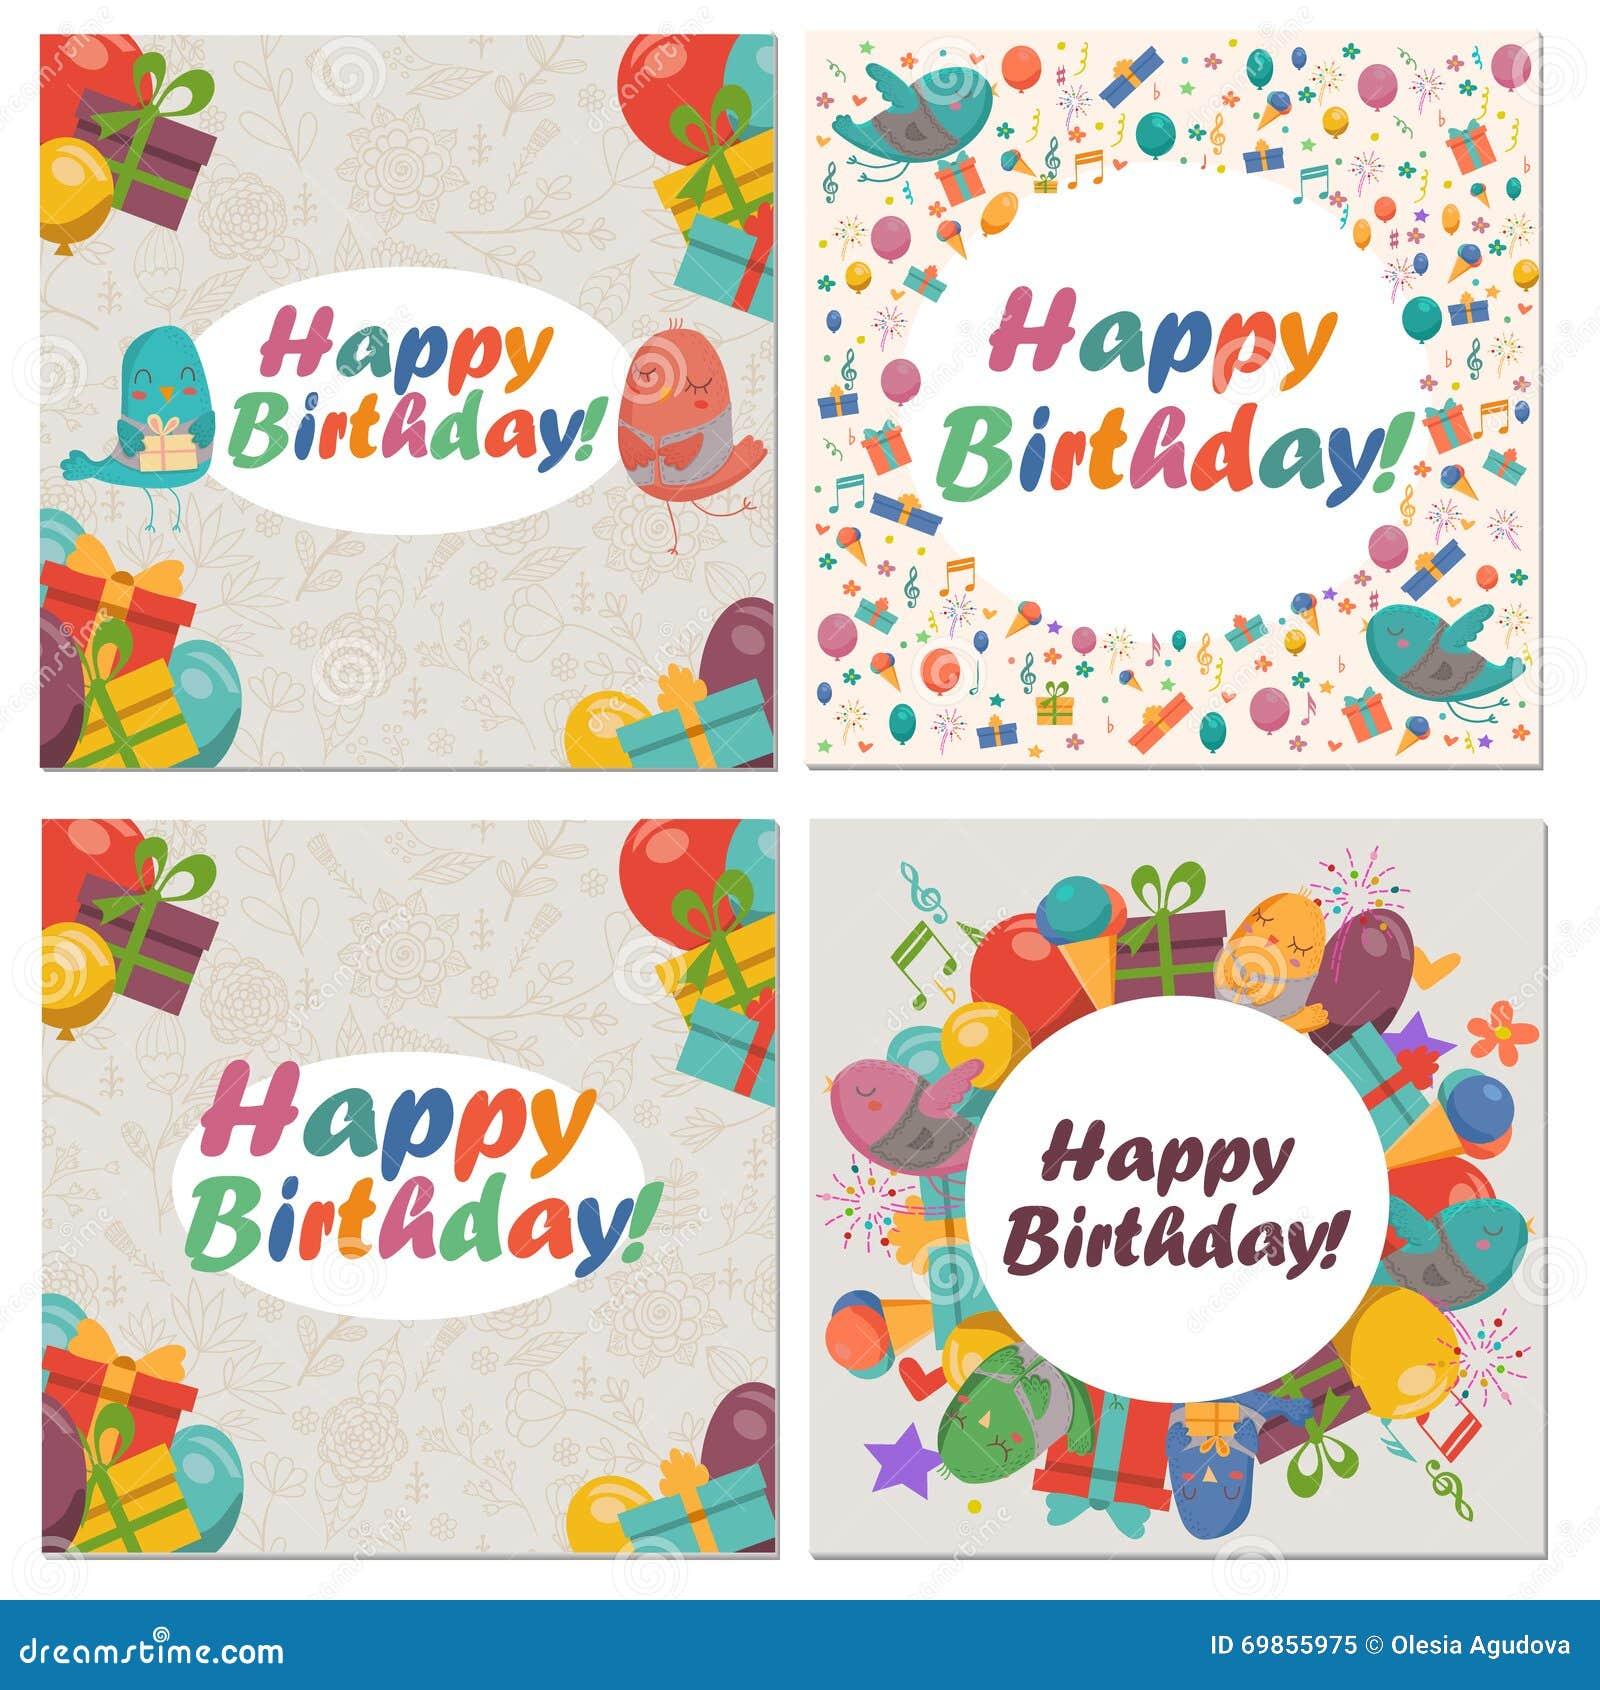 Set Of Birthday Card With Cute Birdsflowers And Balloonsice Cream